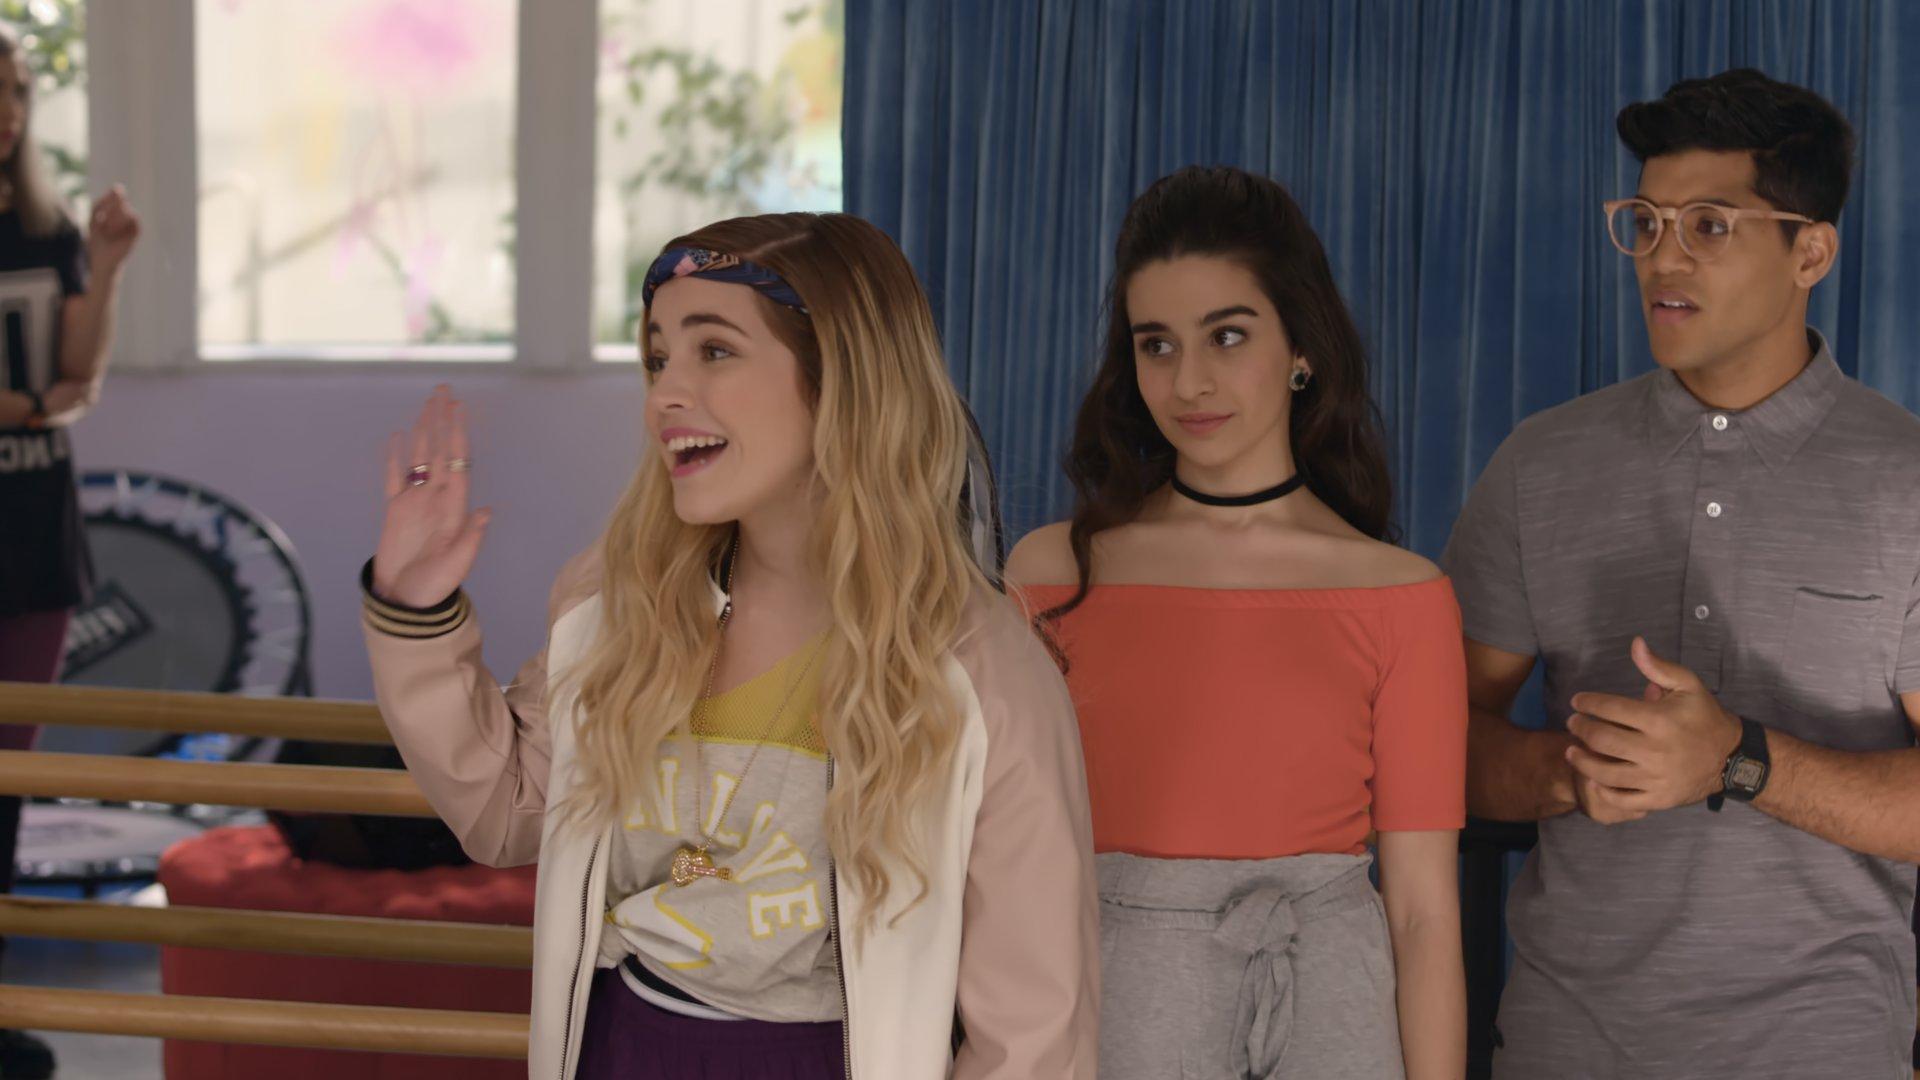 Go Sei Du Selbst Staffel 2 Ab Jetzt Bei Netflix Im Stream Kino De